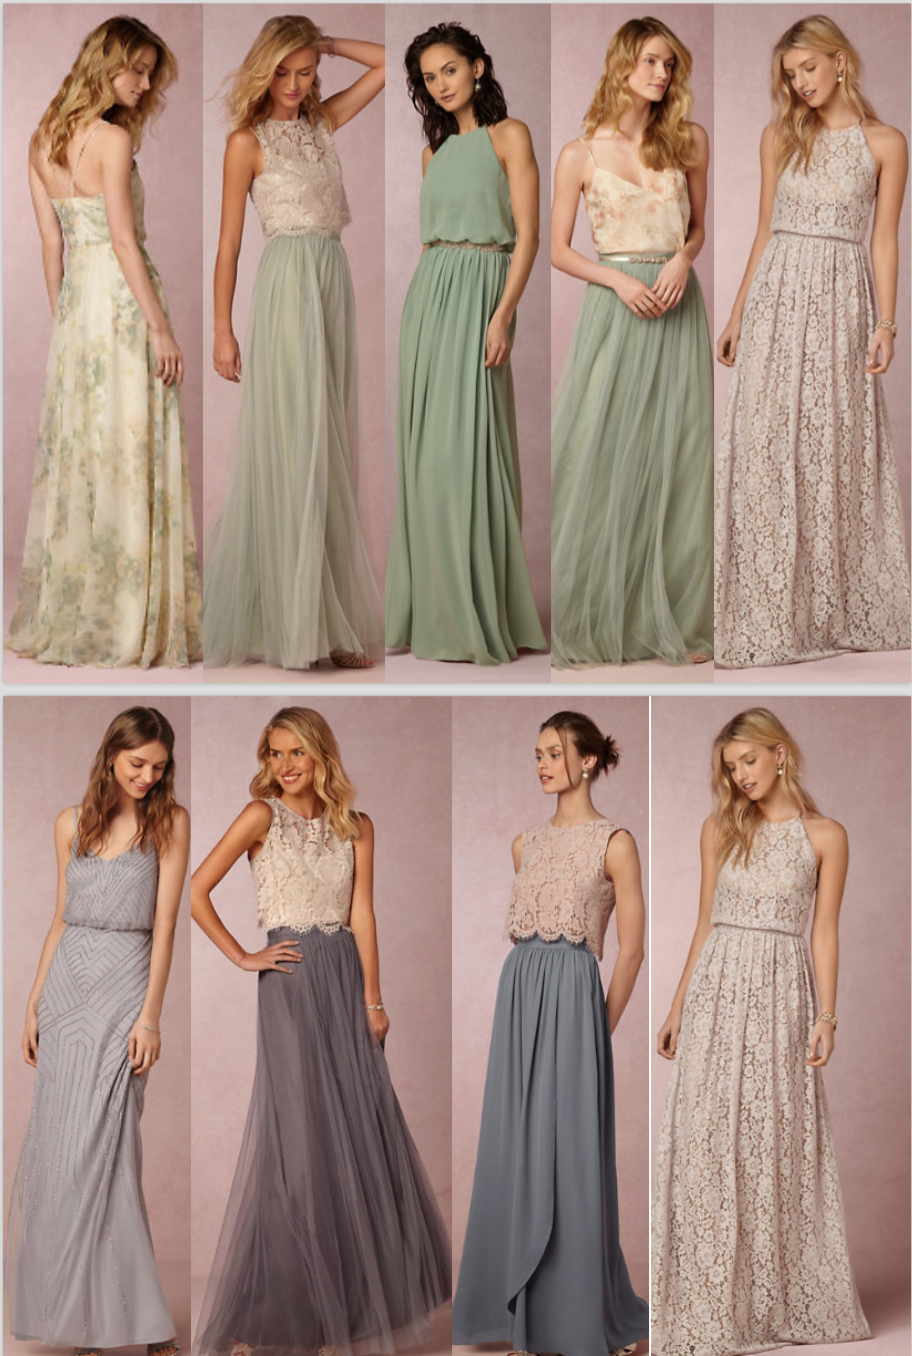 Shelbs' Creativity Shining Through. Bridesmaid Dress Ideas